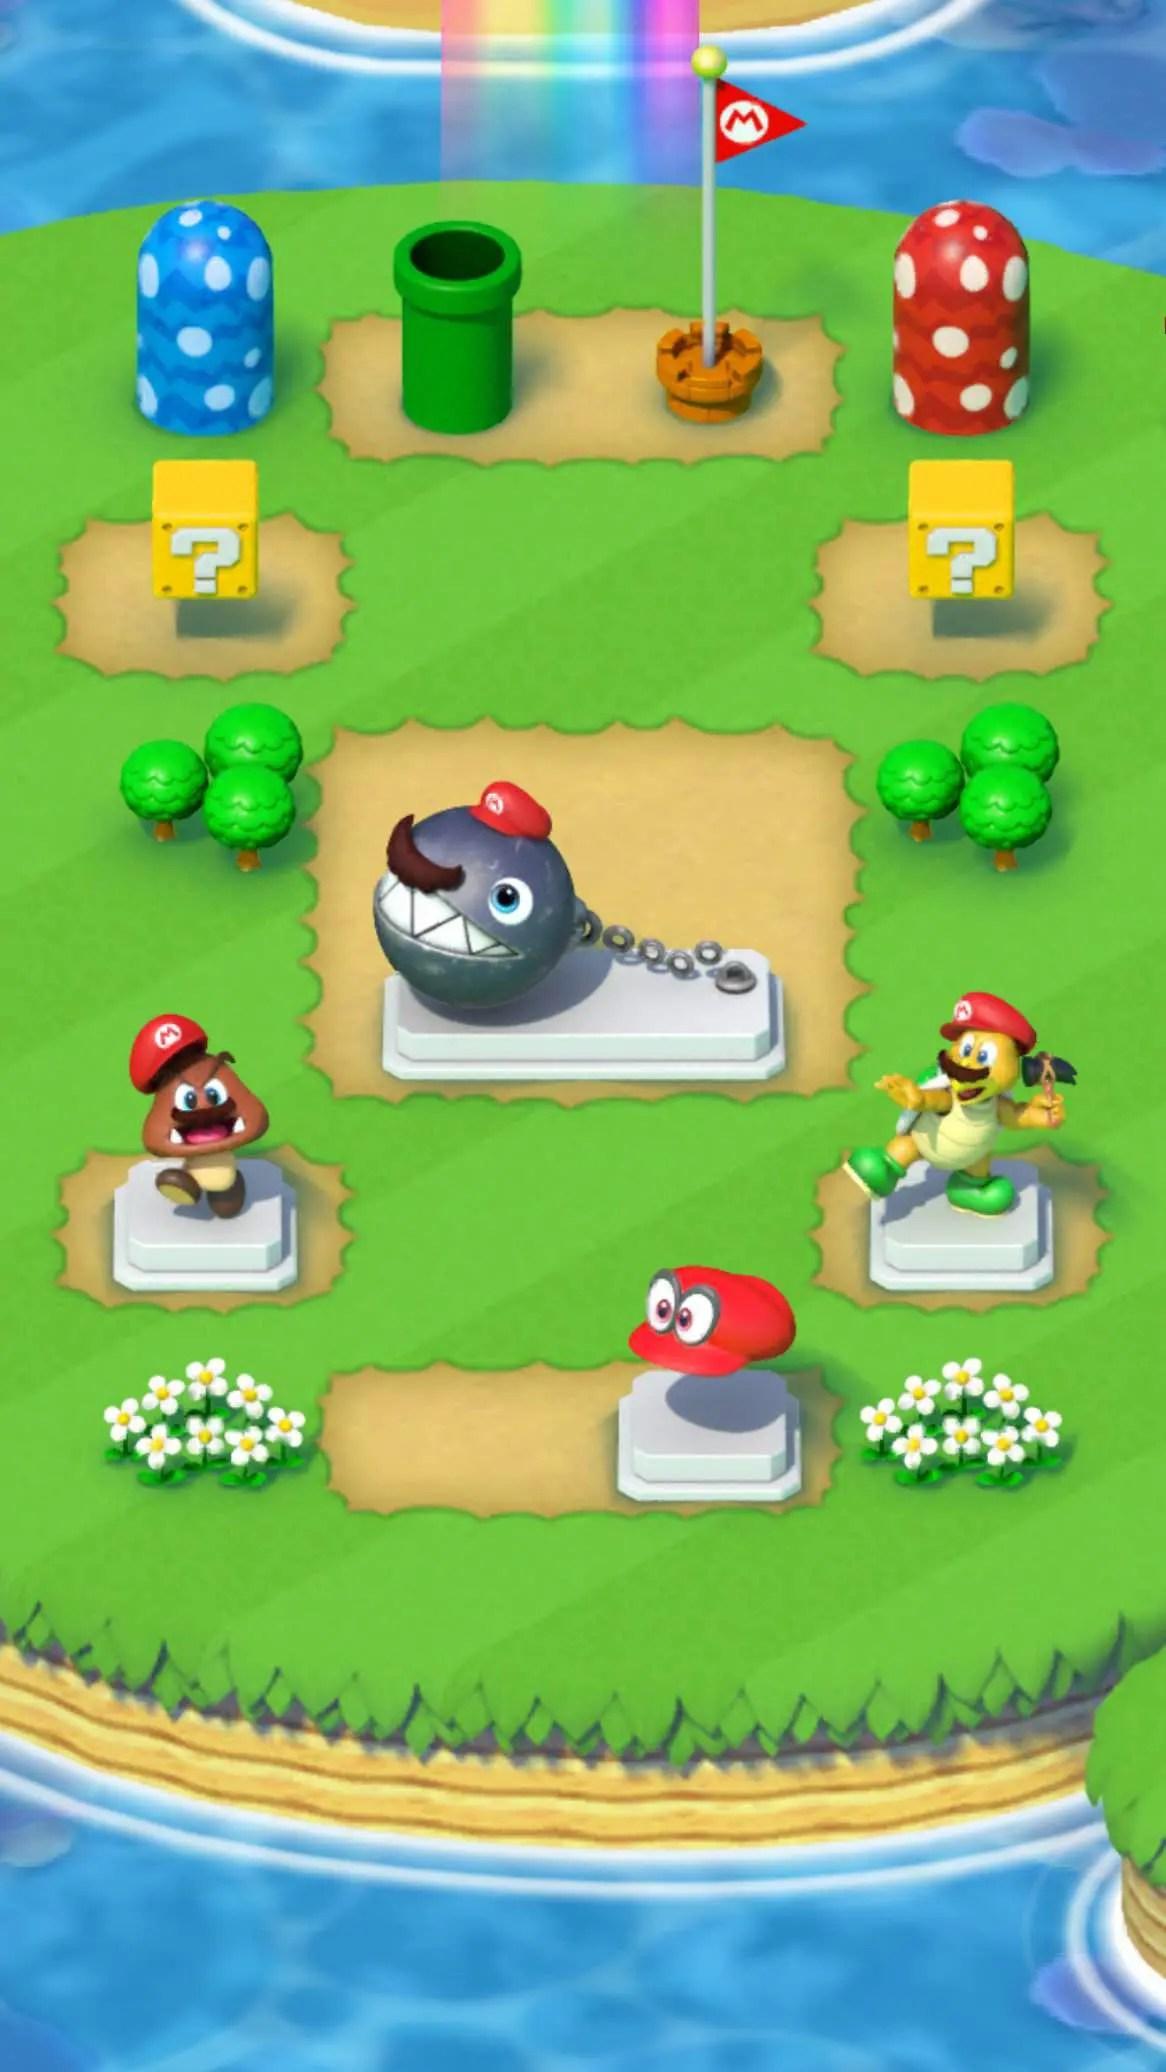 E3 2017 Super Mario Run Adds Super Mario Odyssey Crossover Items Nintendo Insider